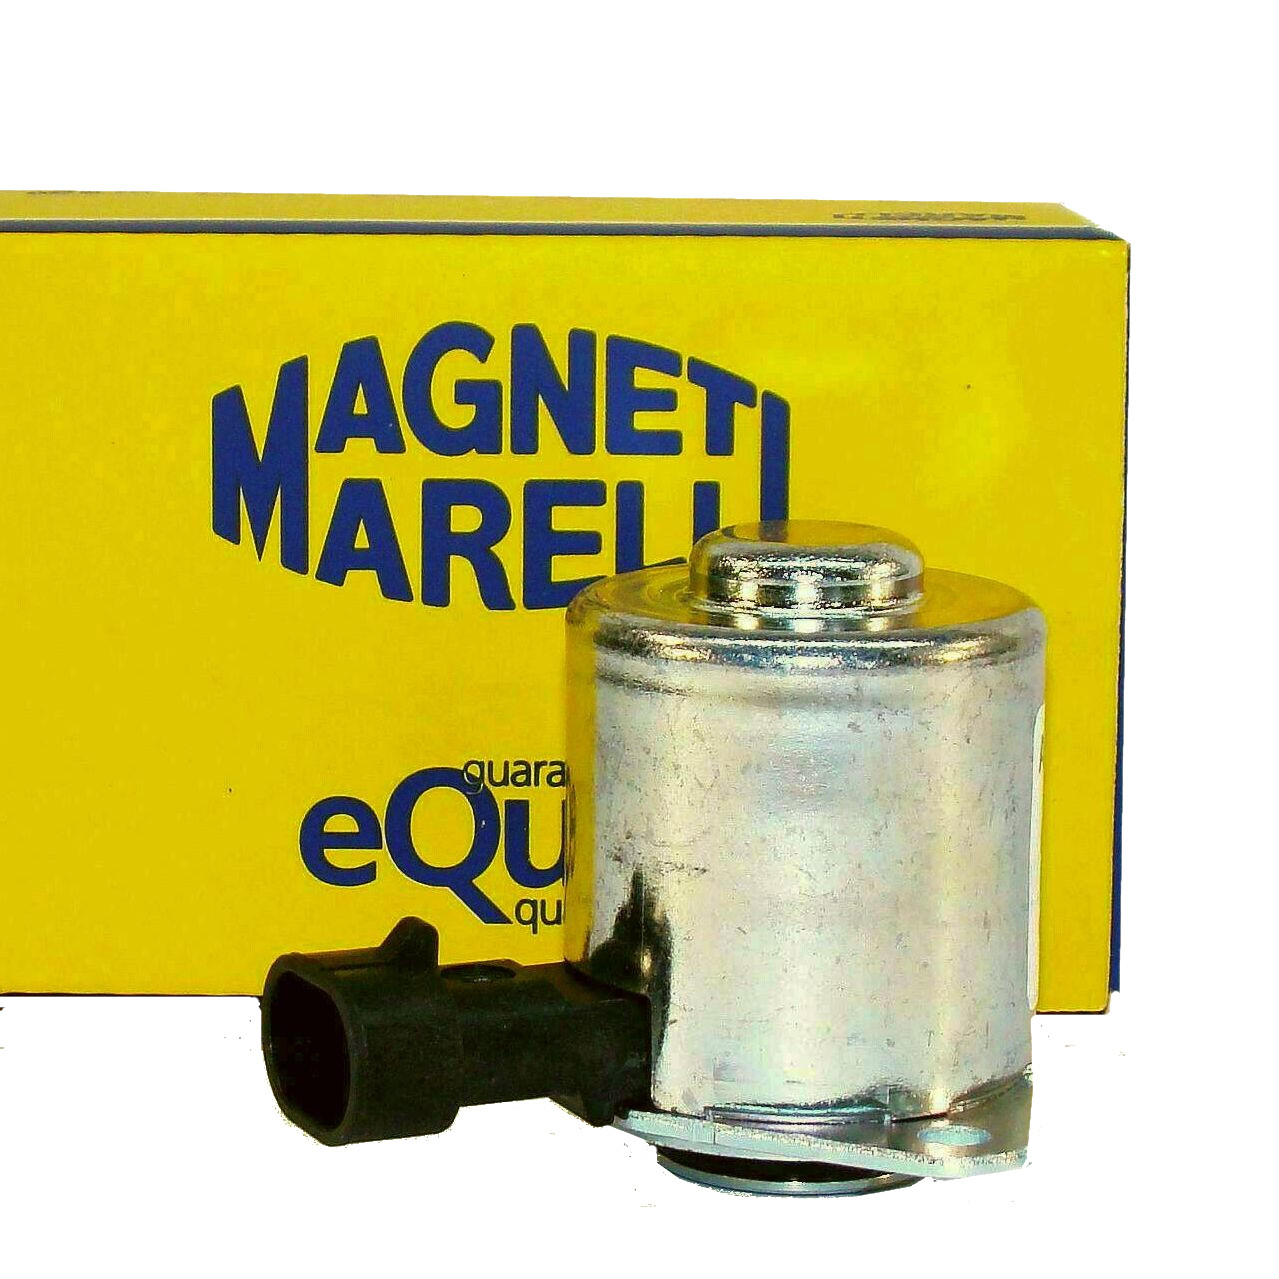 Hydraulikaggregat-Autom.Getr MAGNETI MARELLI Ventileinheit 024000015010